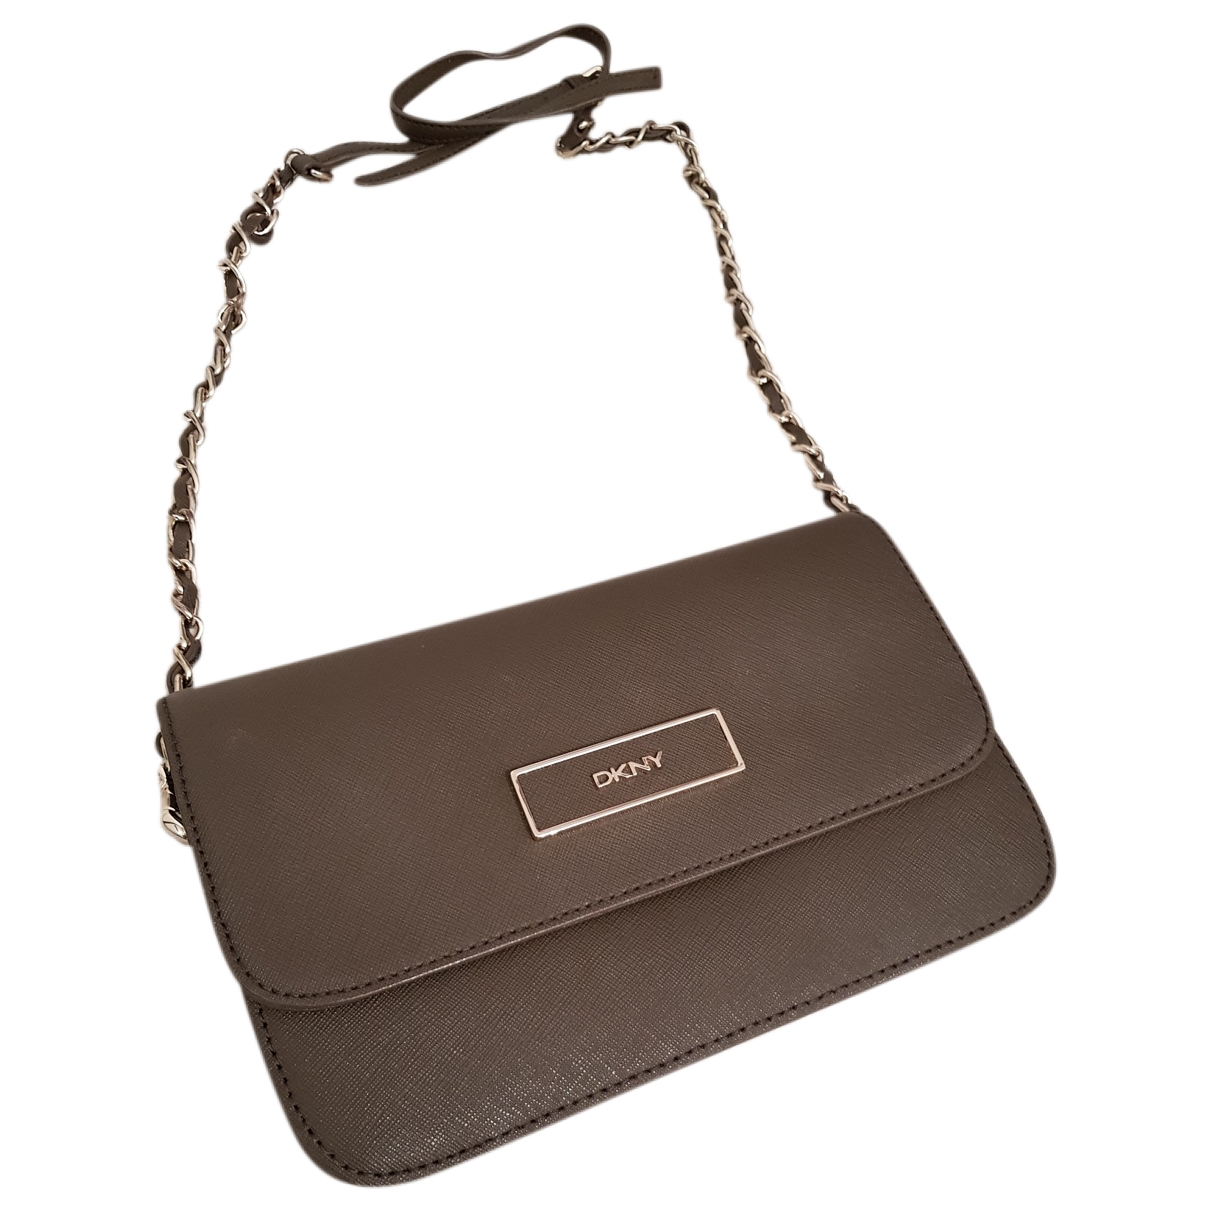 Dkny - Pochette   pour femme en cuir - kaki